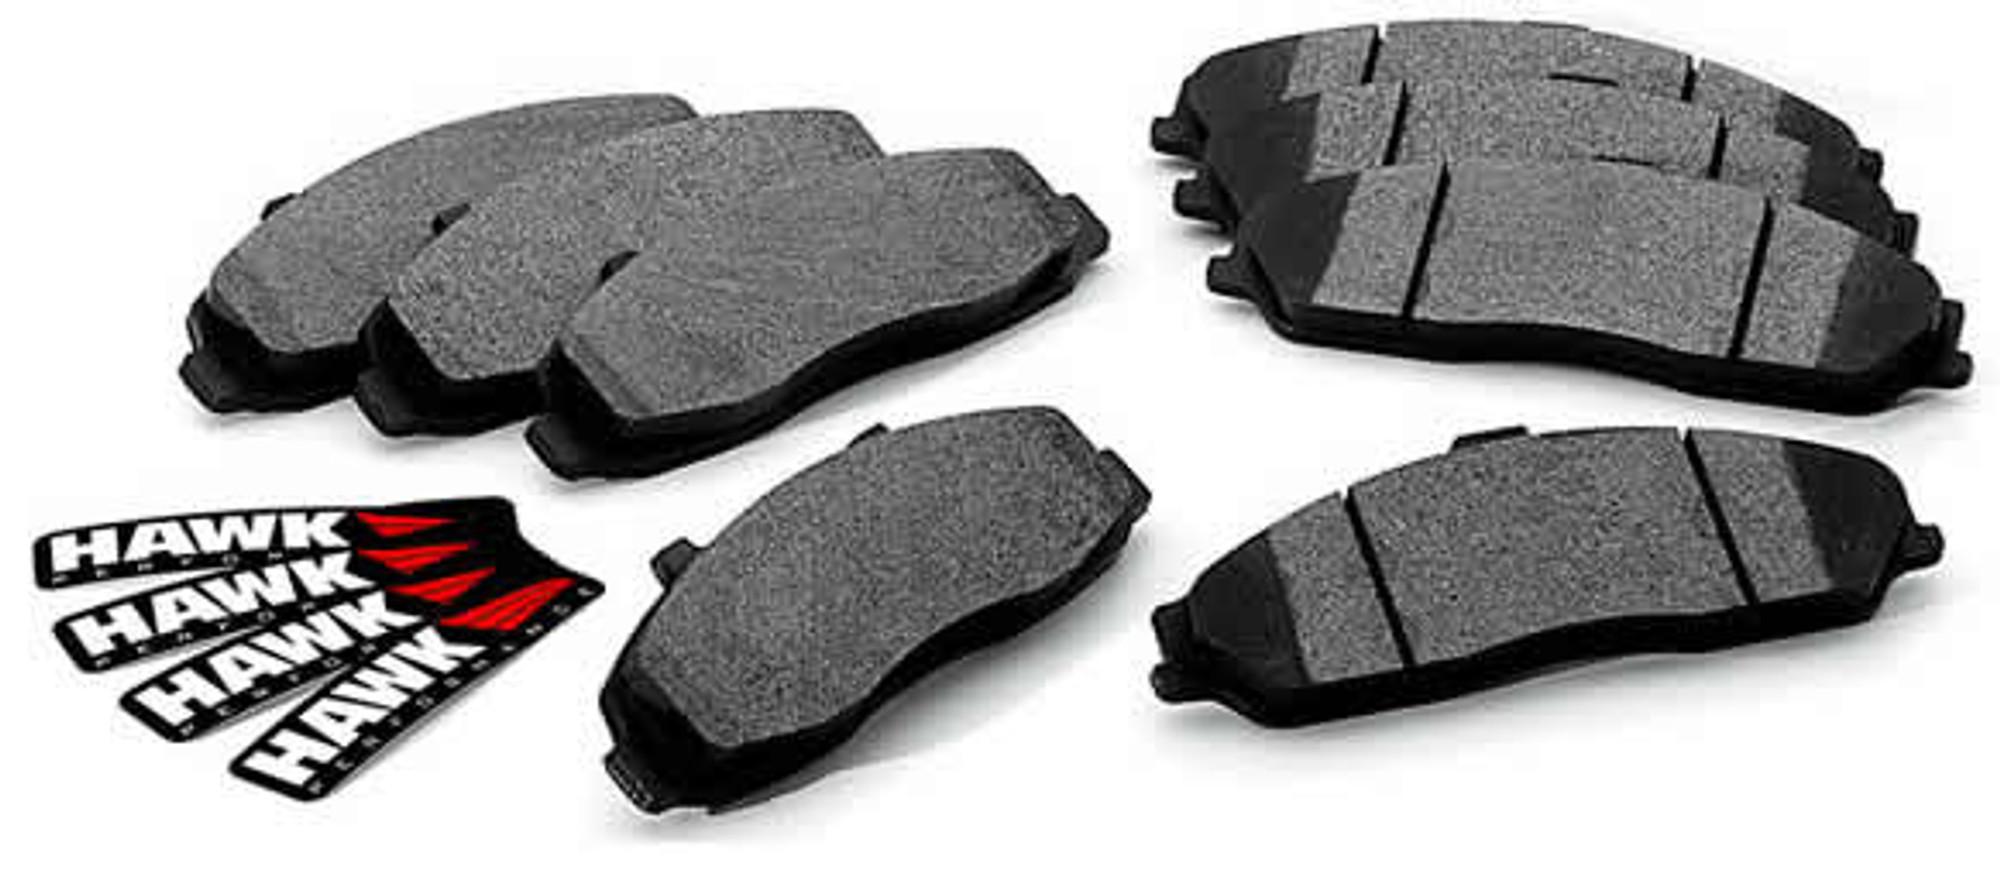 Hawk Brake Pads >> Hawk Hps Performance Brake Pads 98 02 F Body Front